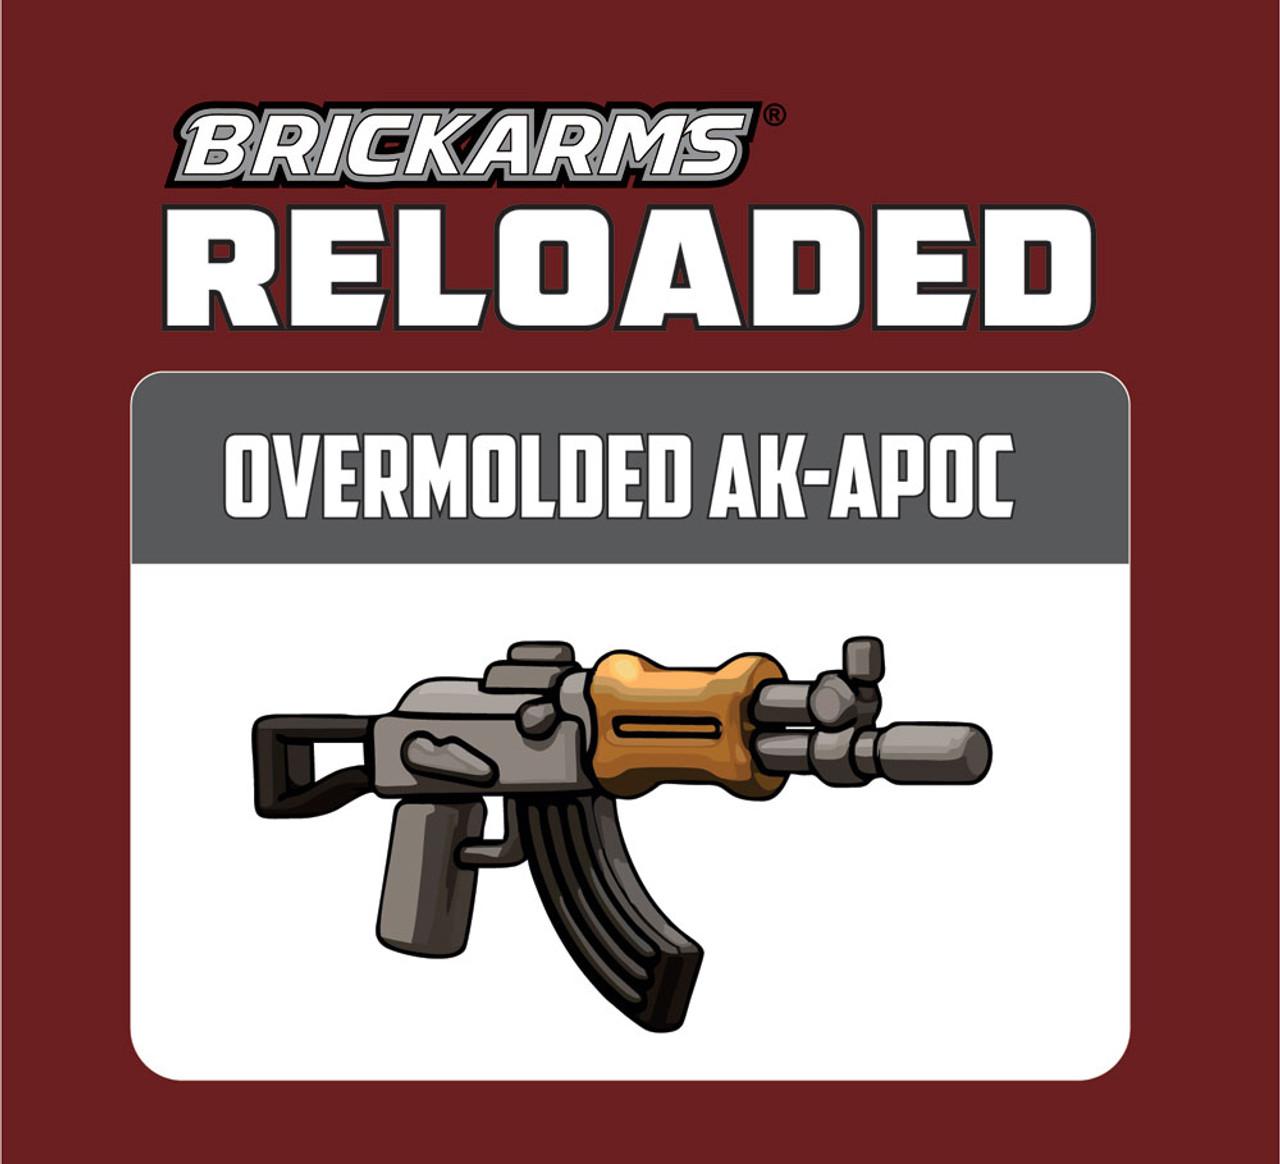 BrickArms AK-APOC Rifle for Minifigures Soldier Military